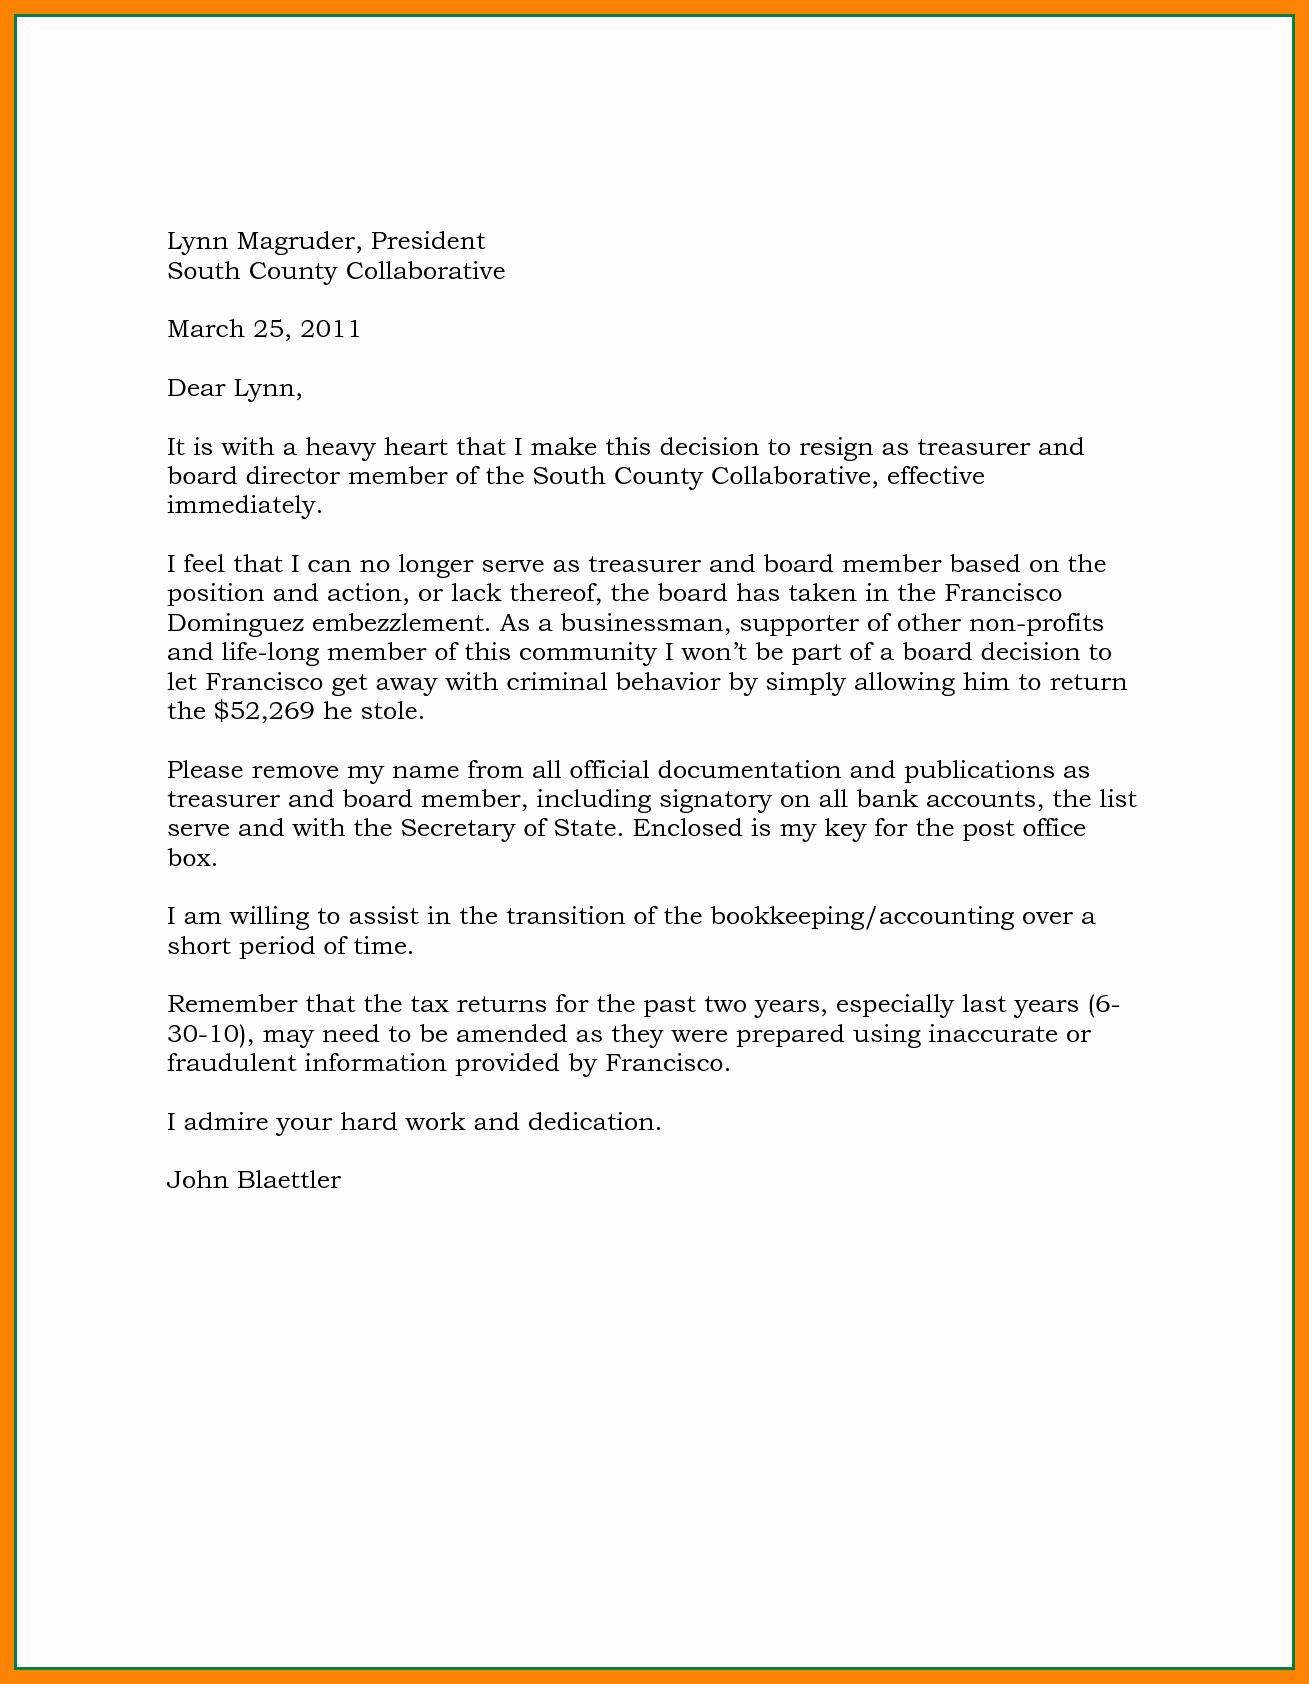 40 Resignation Letter Effective Immediately | Desalas Template